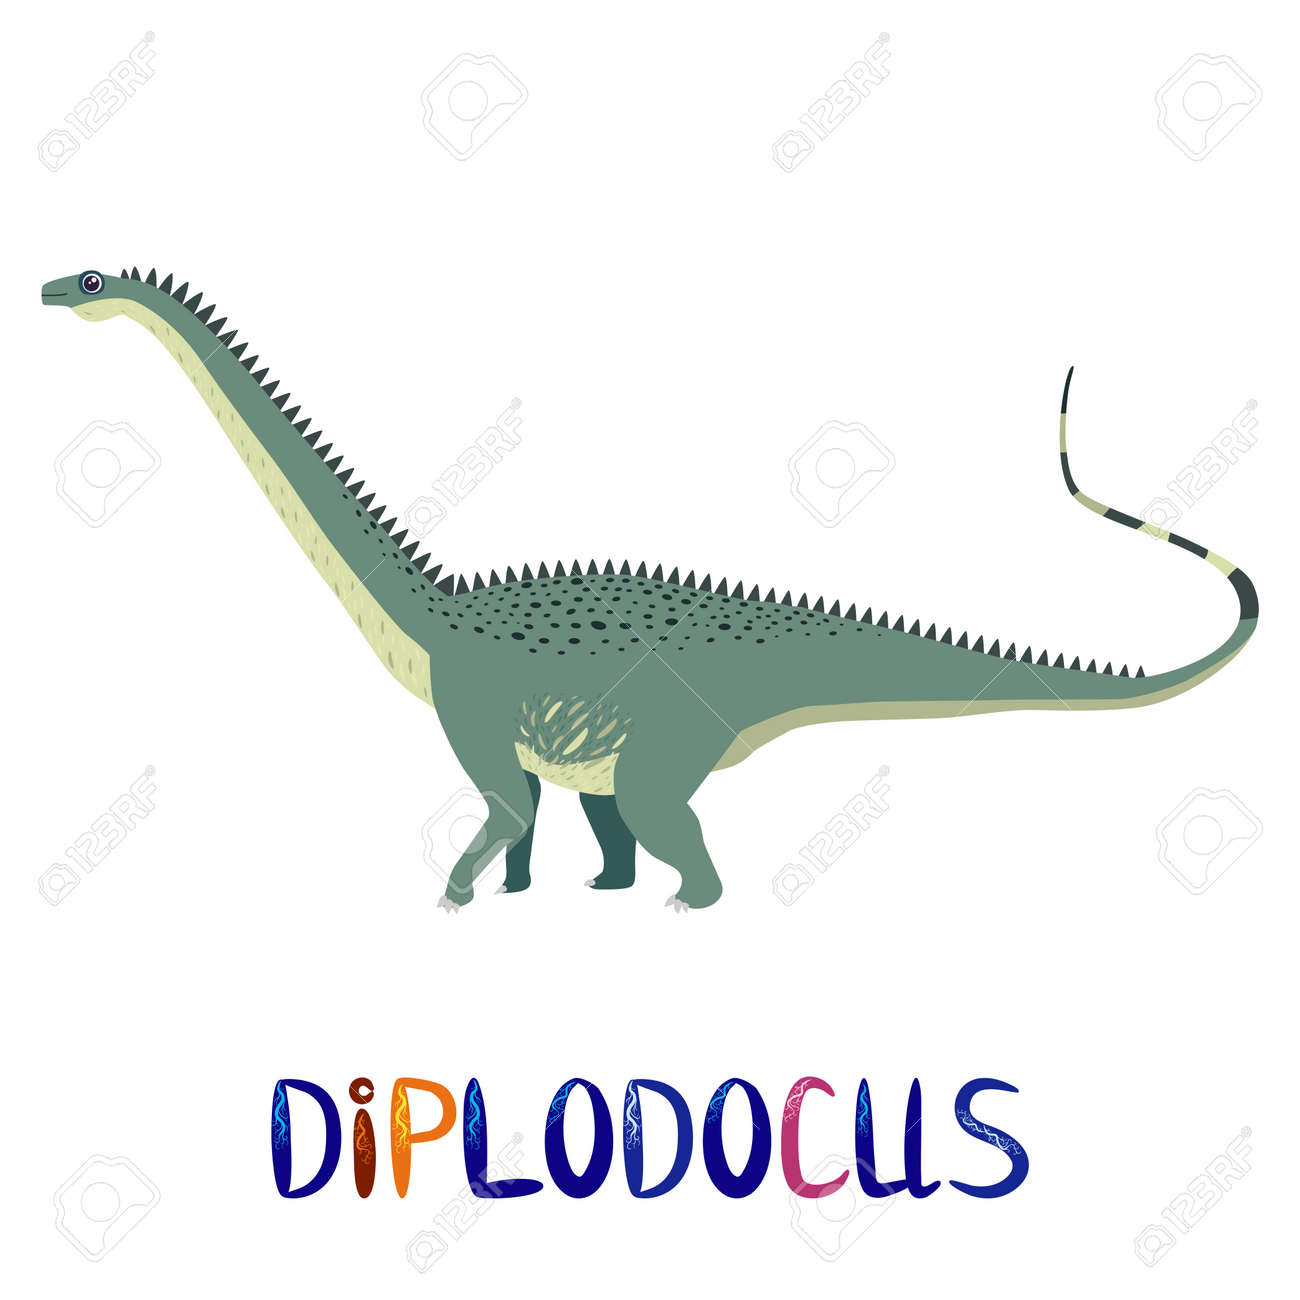 Marsh diplodocus, prehistoric dinosaurs collection. Ancient animals. Hand drawn. - 170465942